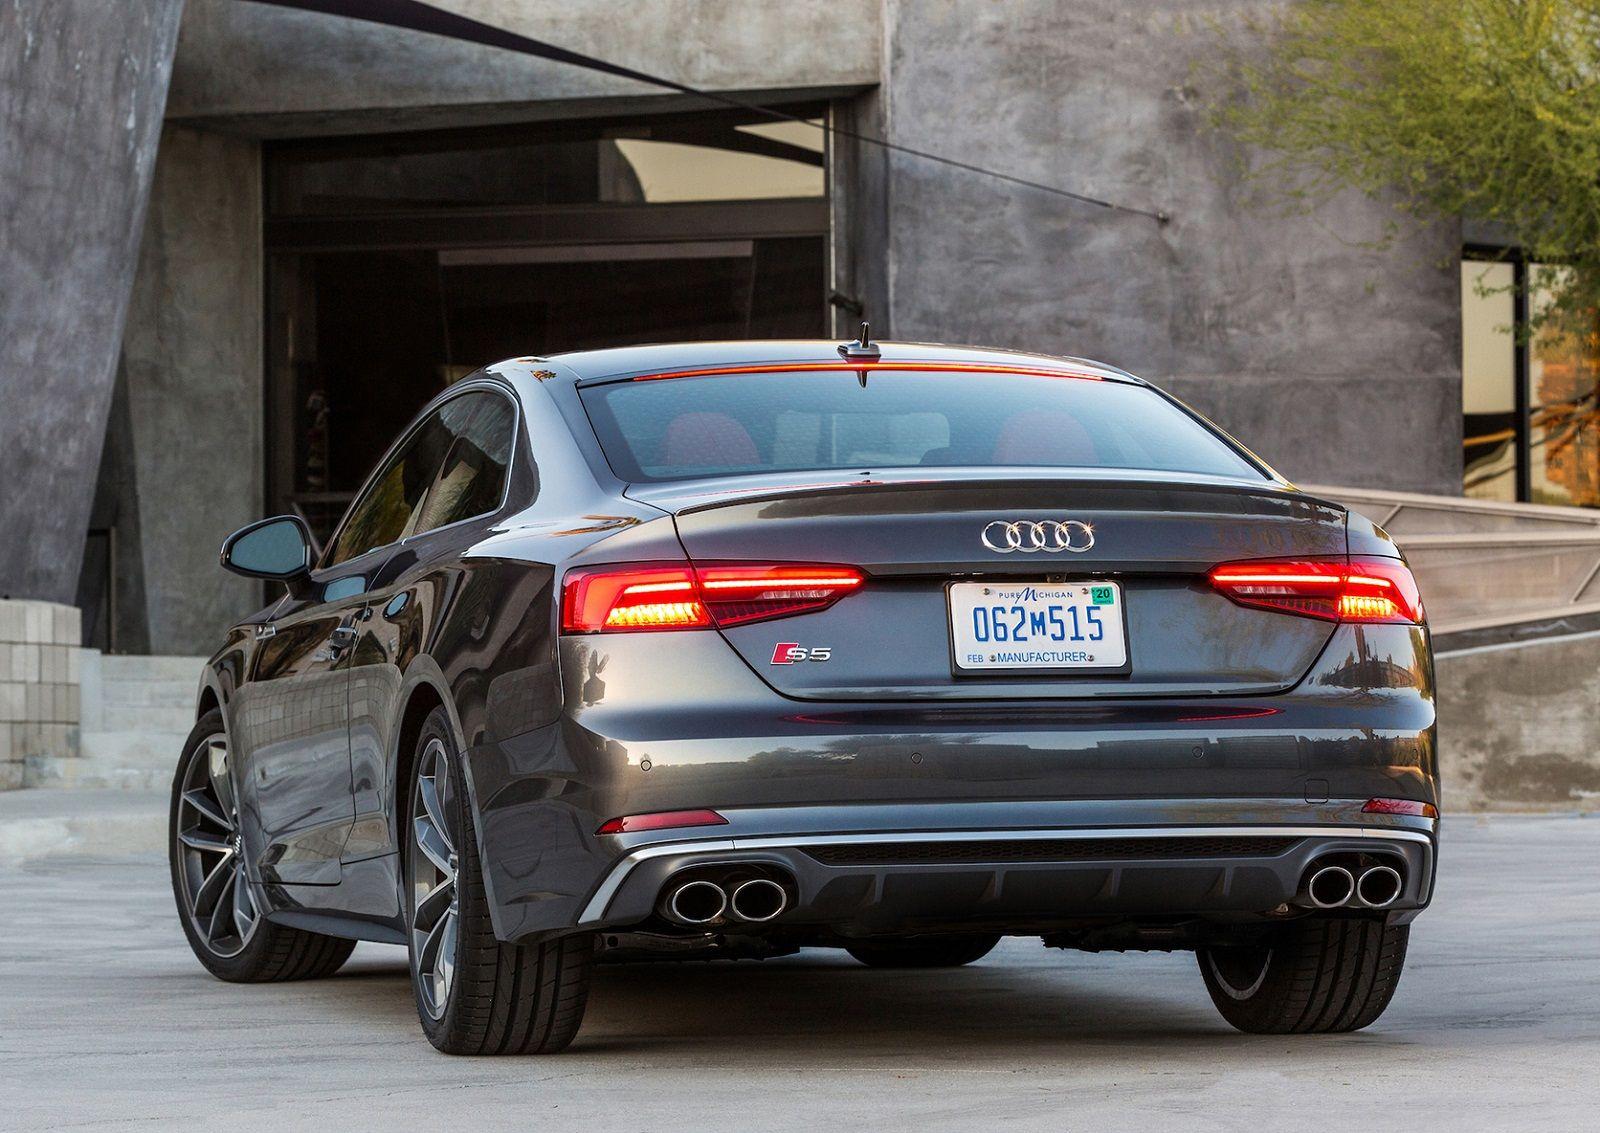 Audi S52019 Release Date, Price【2020】